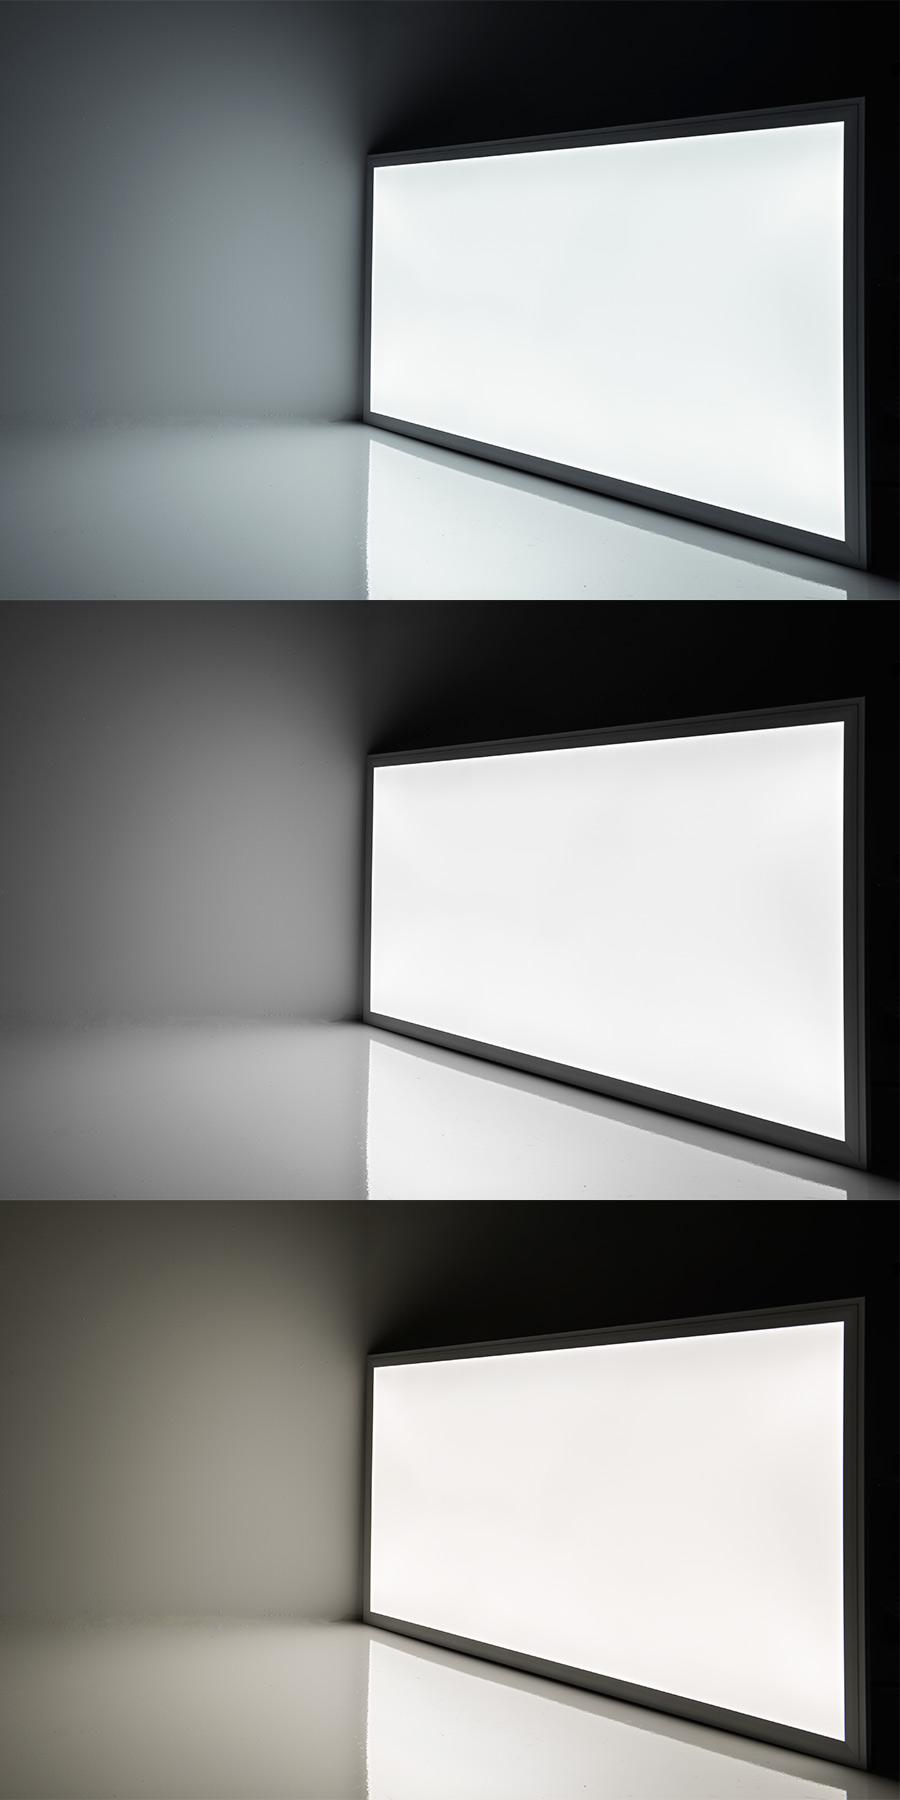 led panel light 2x4 5 600 lumens 50w even glow. Black Bedroom Furniture Sets. Home Design Ideas